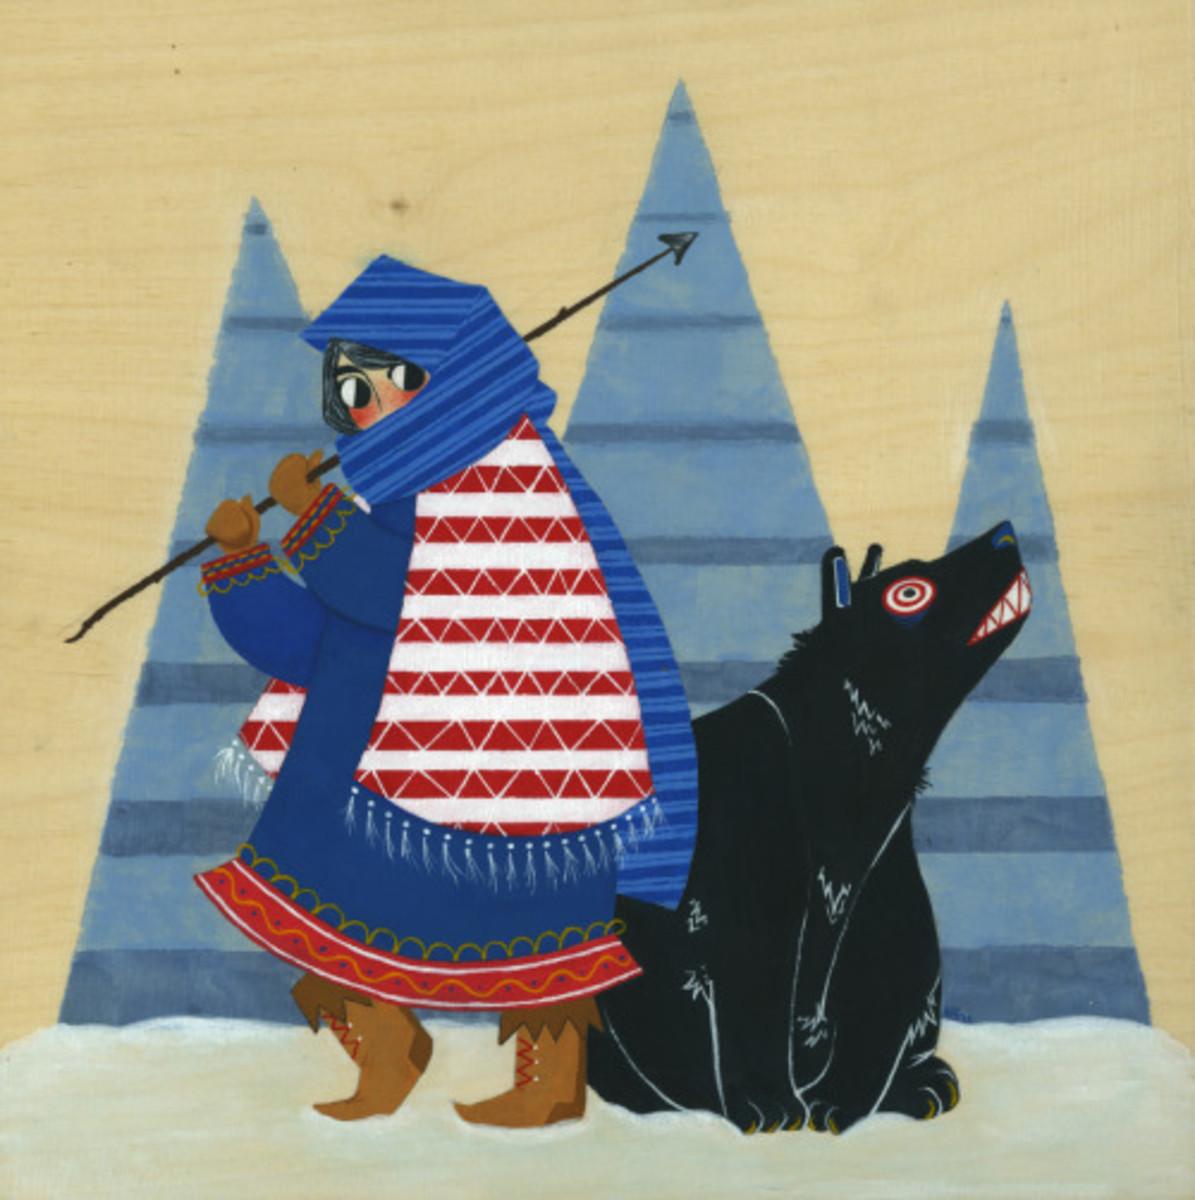 By Hannah Lee Stockdale: Leib-Olmai and hunter